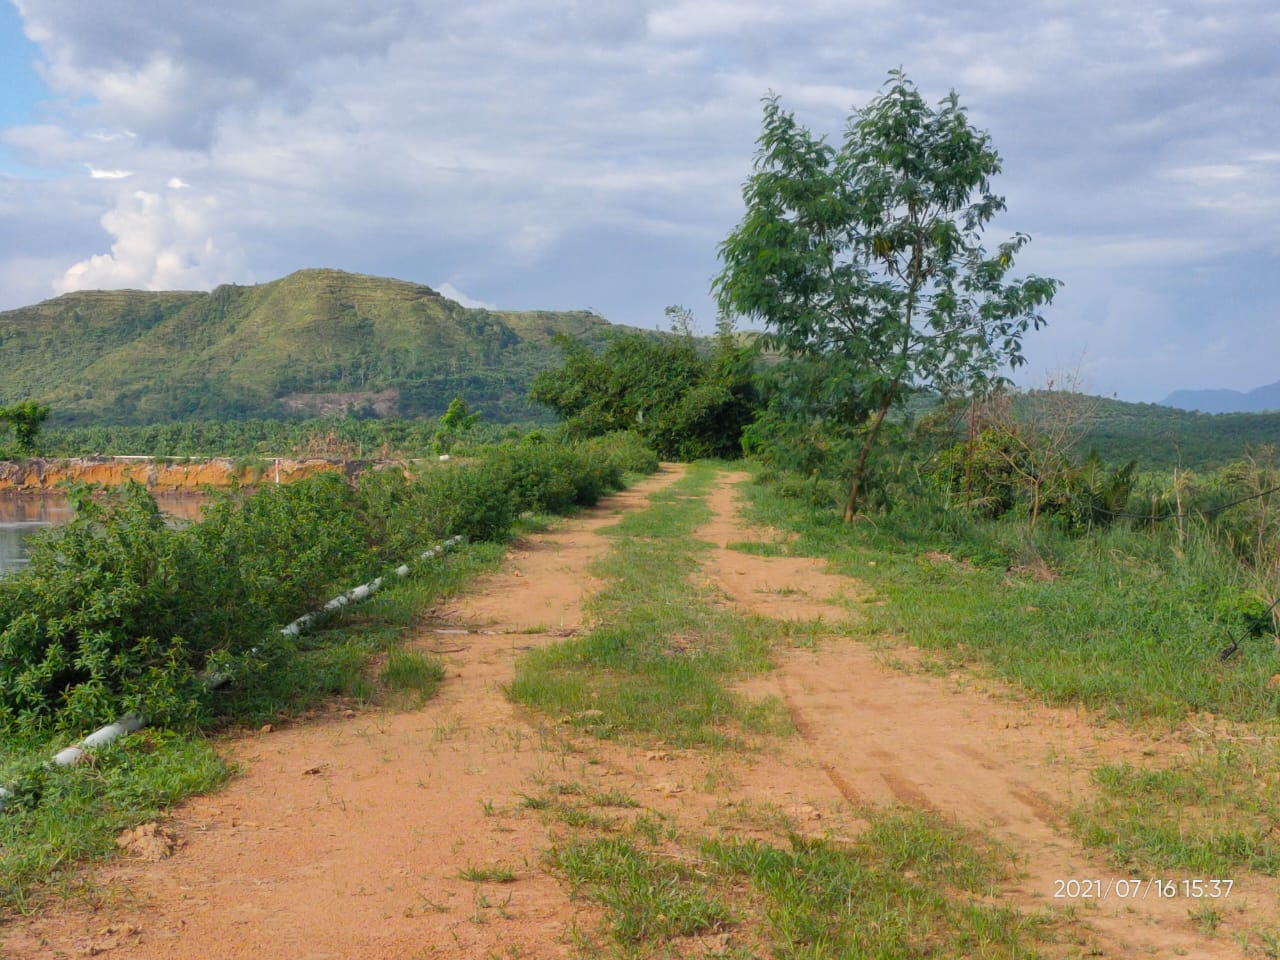 Jalan tanggul BBNM menuju Rumah Pompa